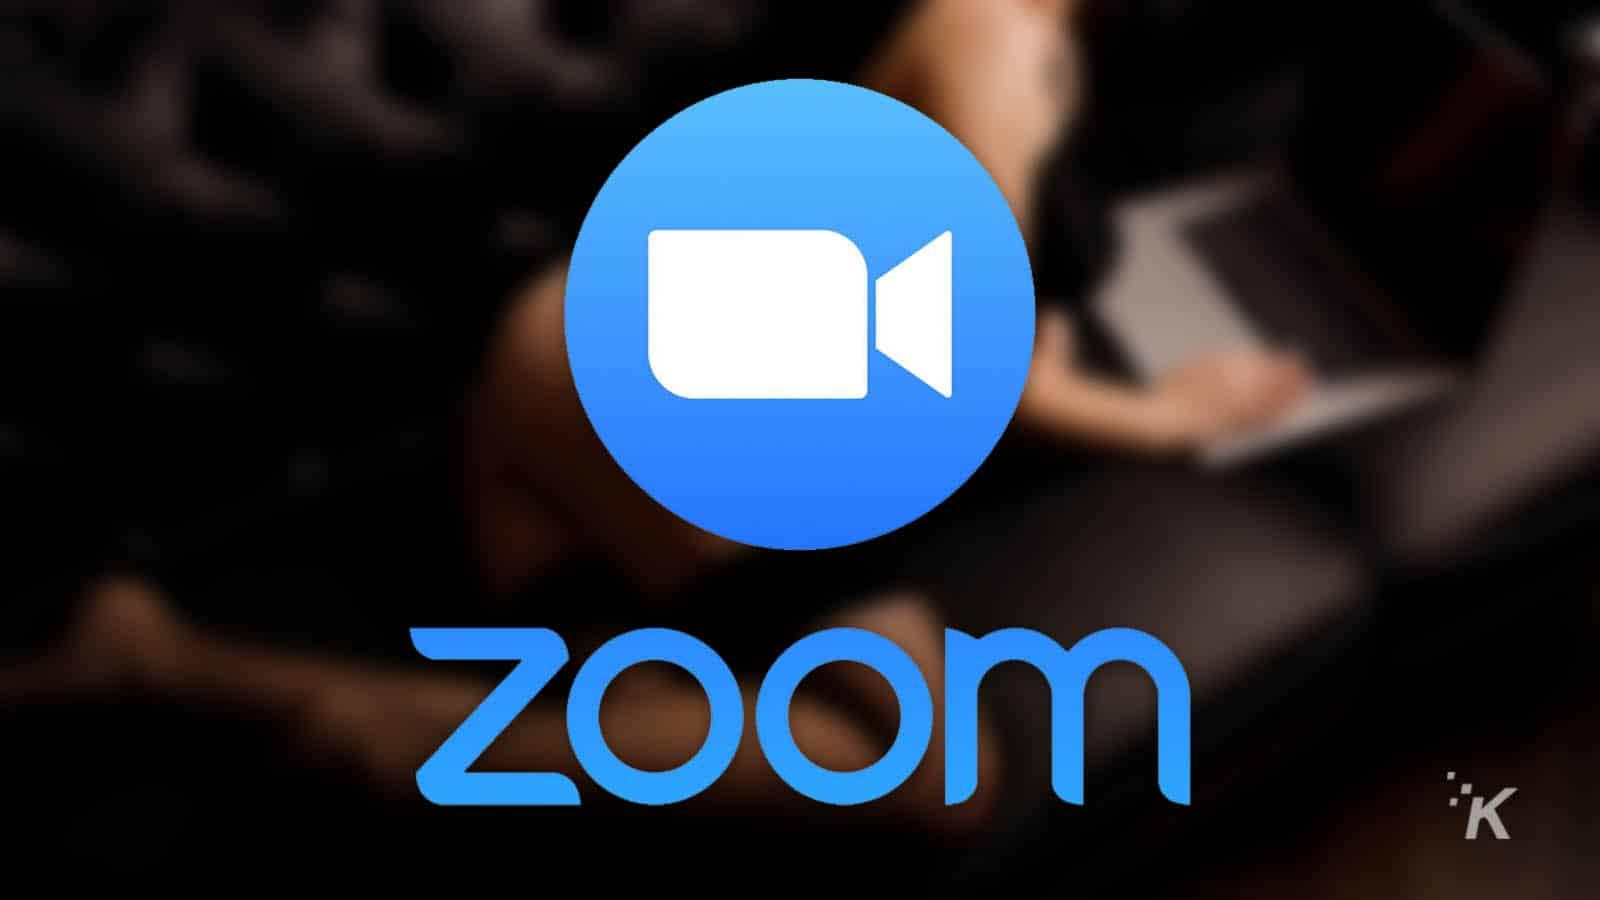 zoom logo on provocative background